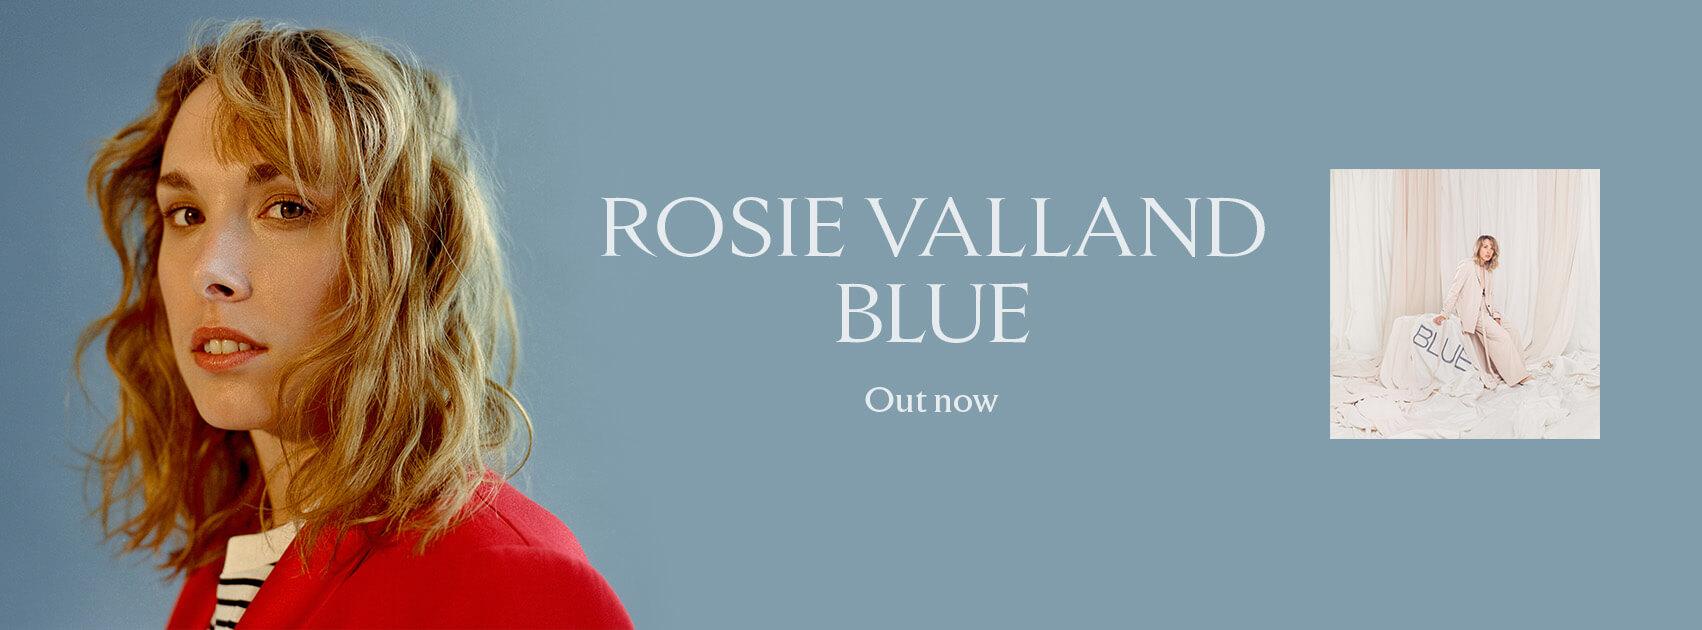 RosieValland-SCRWebsite-EN[1]